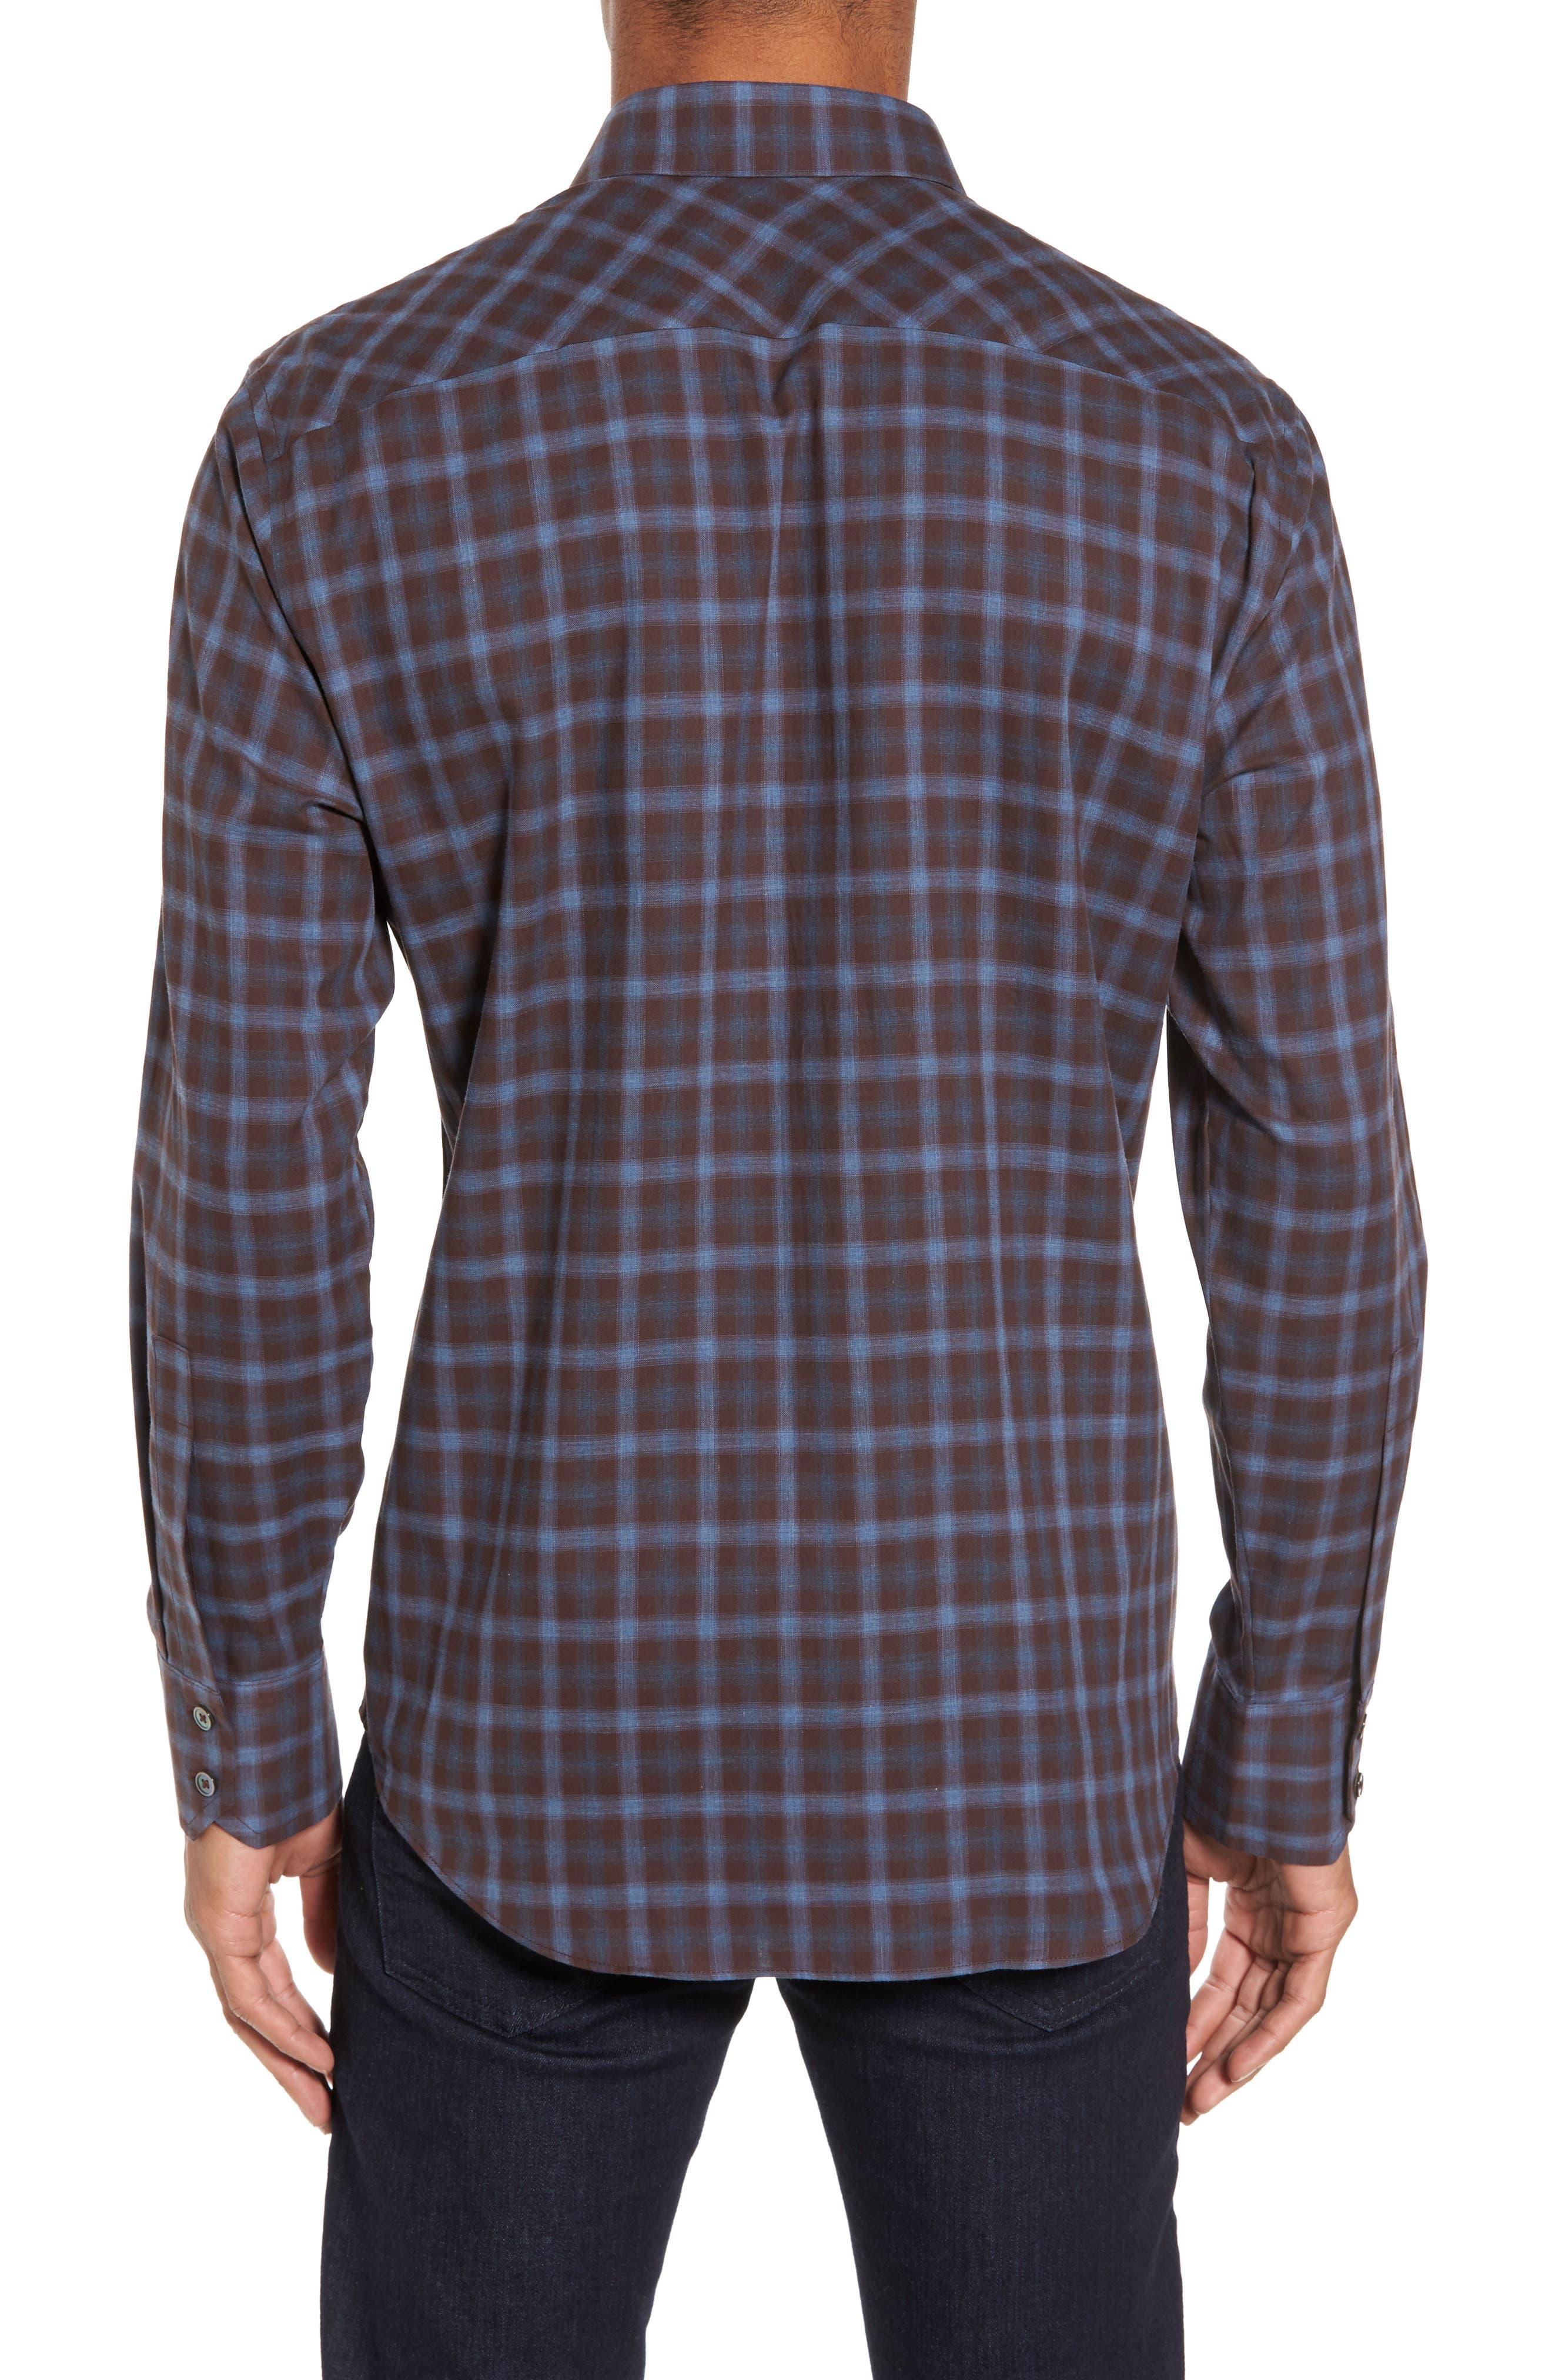 Fathollahi Slim Fit Plaid Sport Shirt,                             Alternate thumbnail 2, color,                             Brown